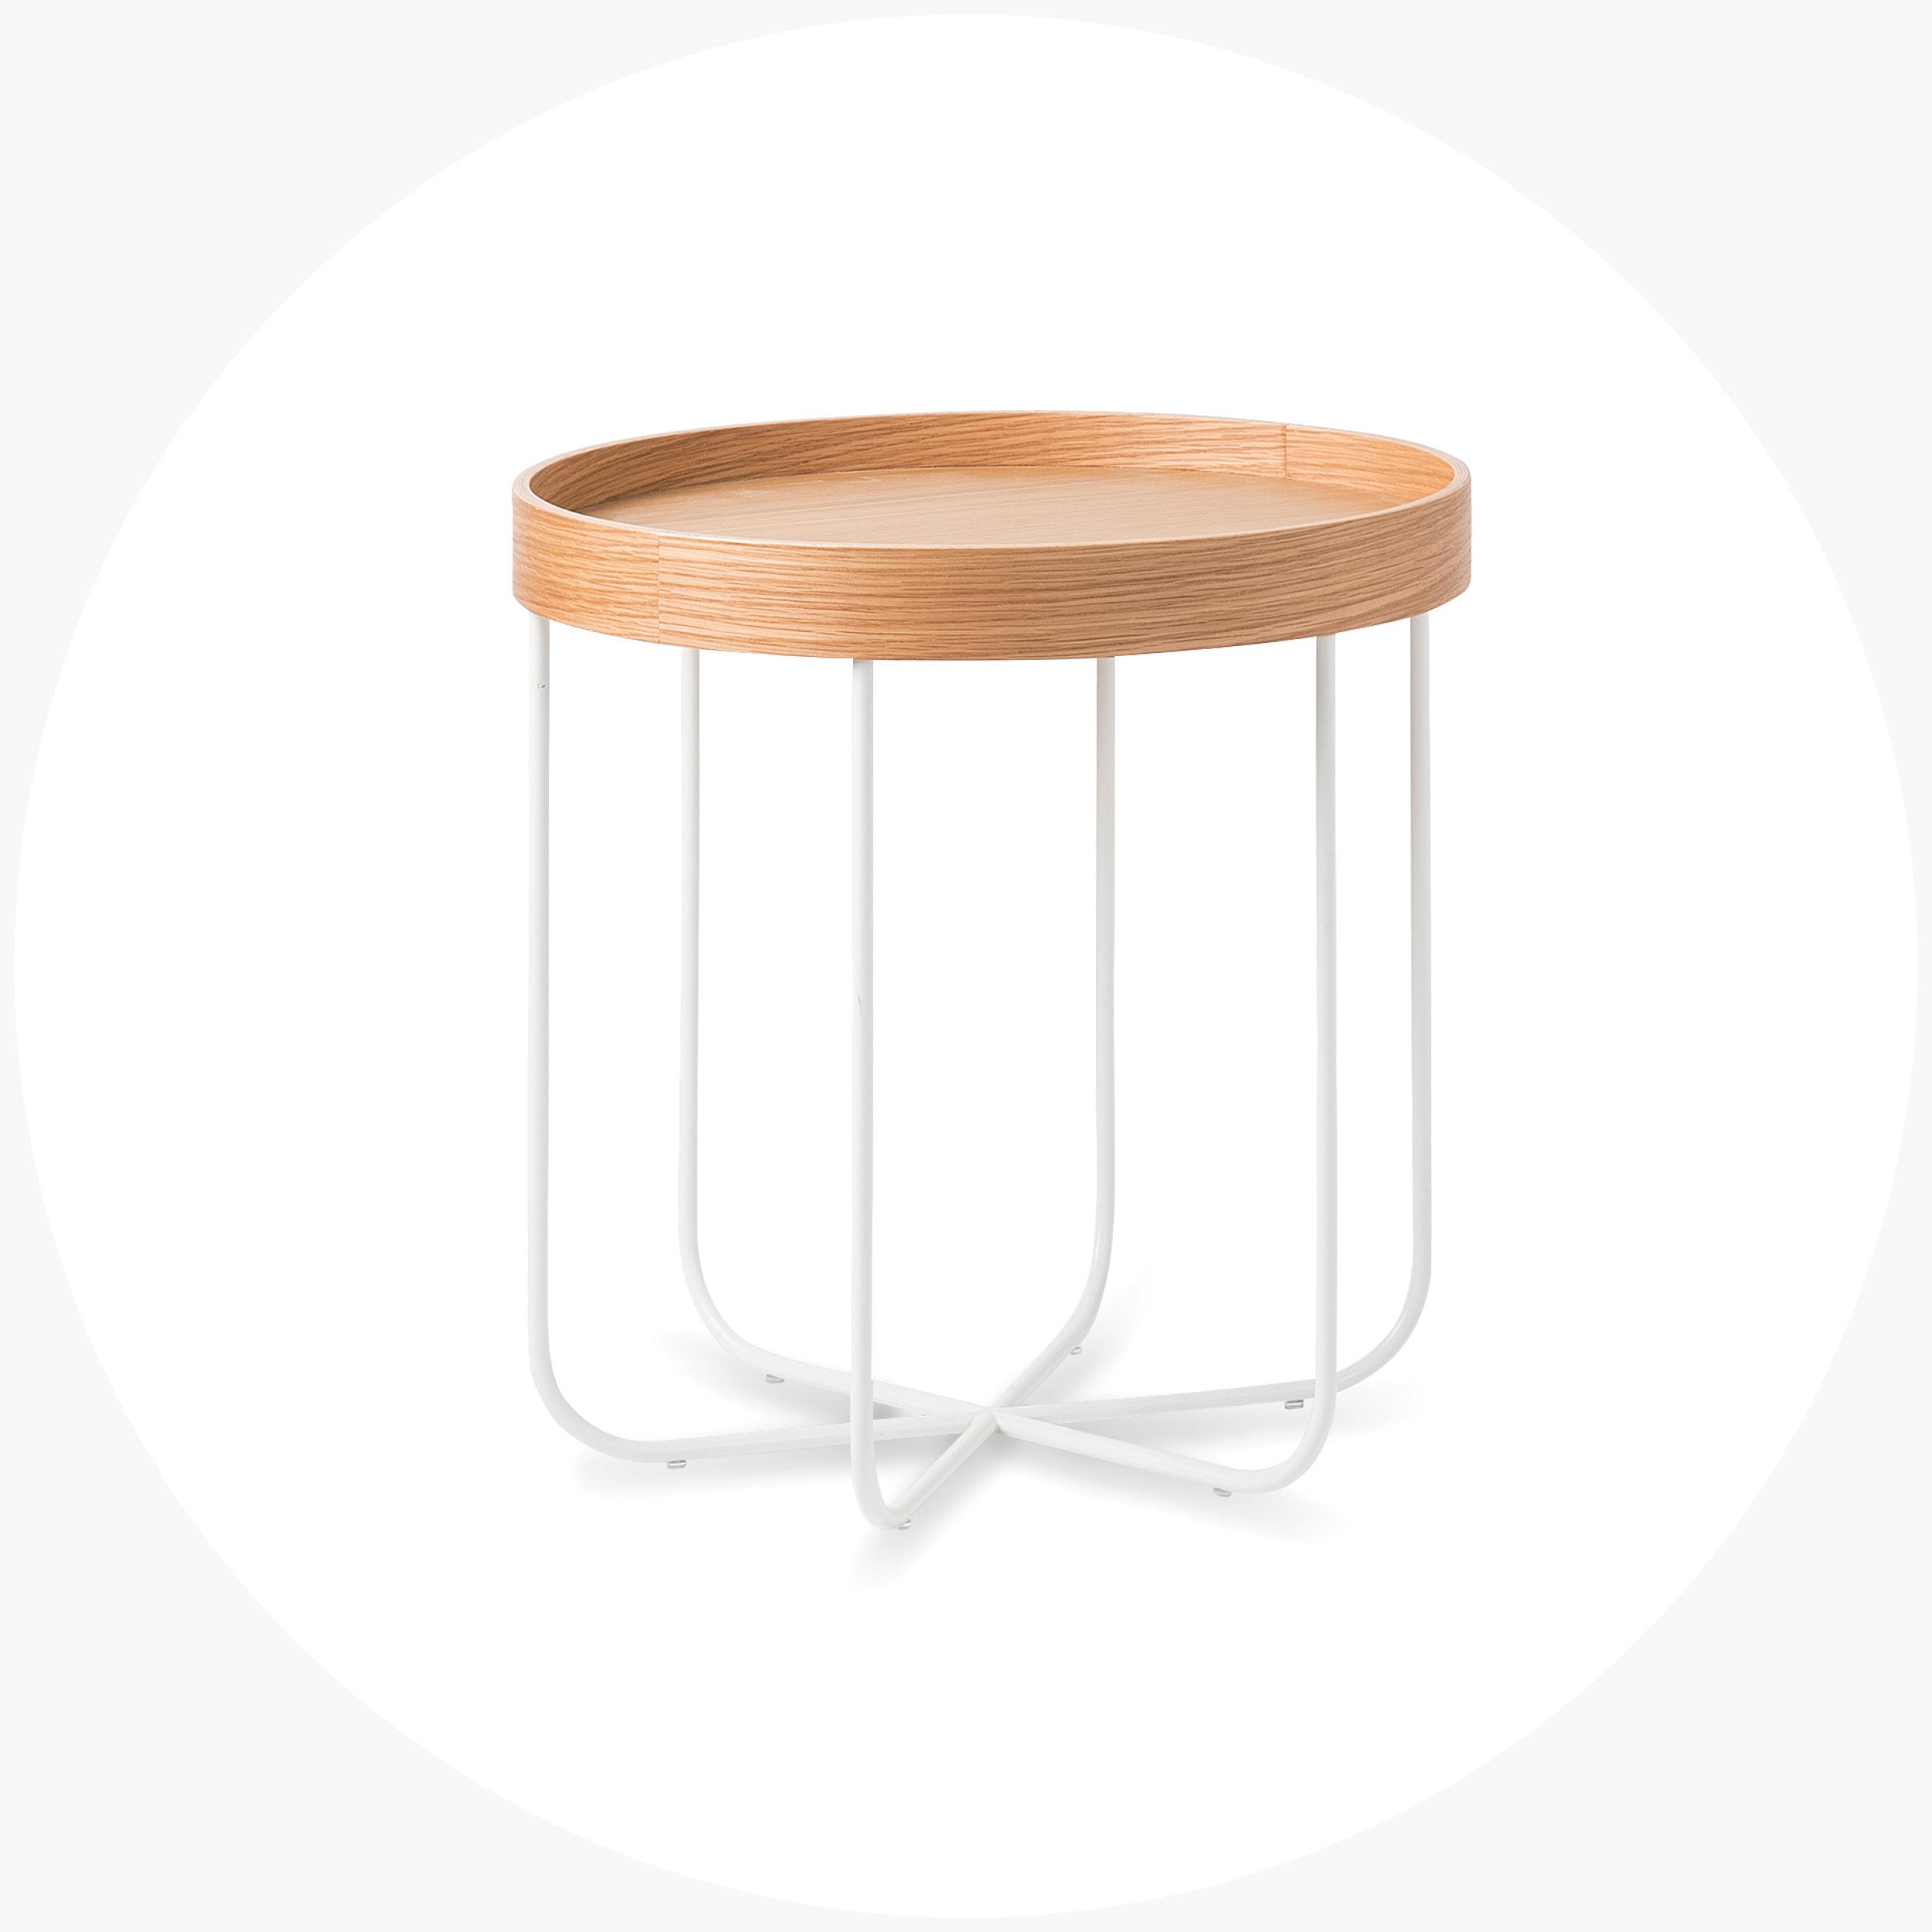 Segment Side Table  $590.00